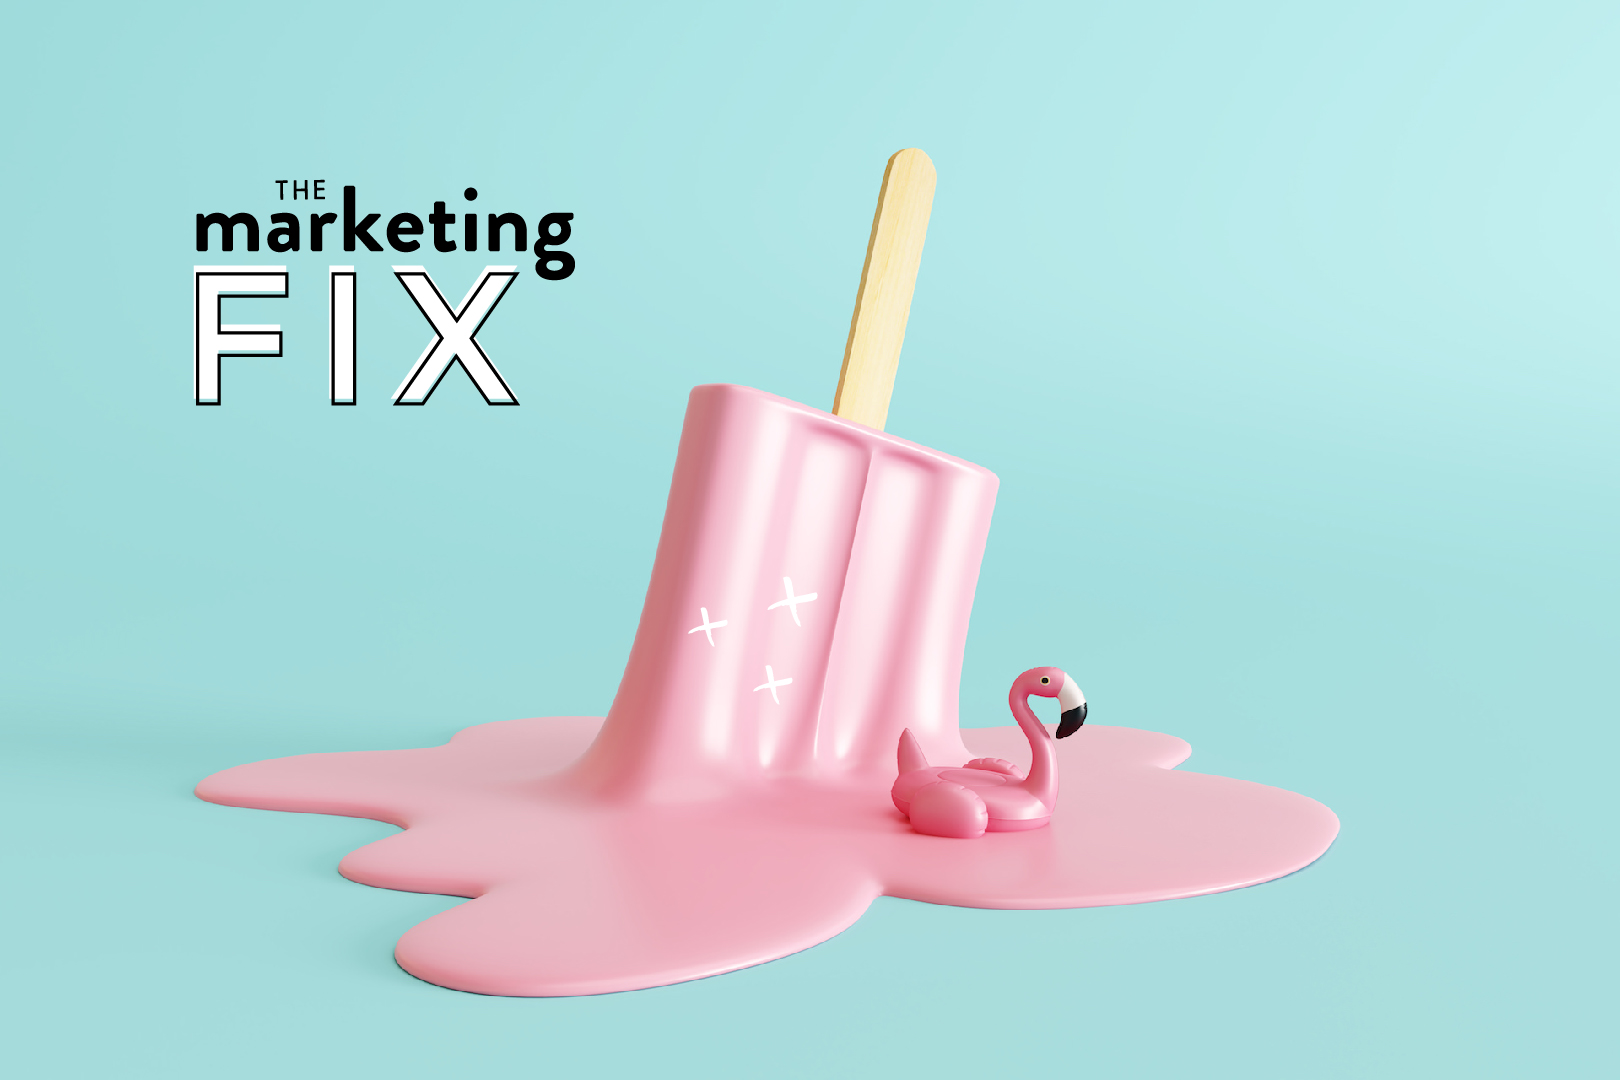 5 Minute Marketing Fixes